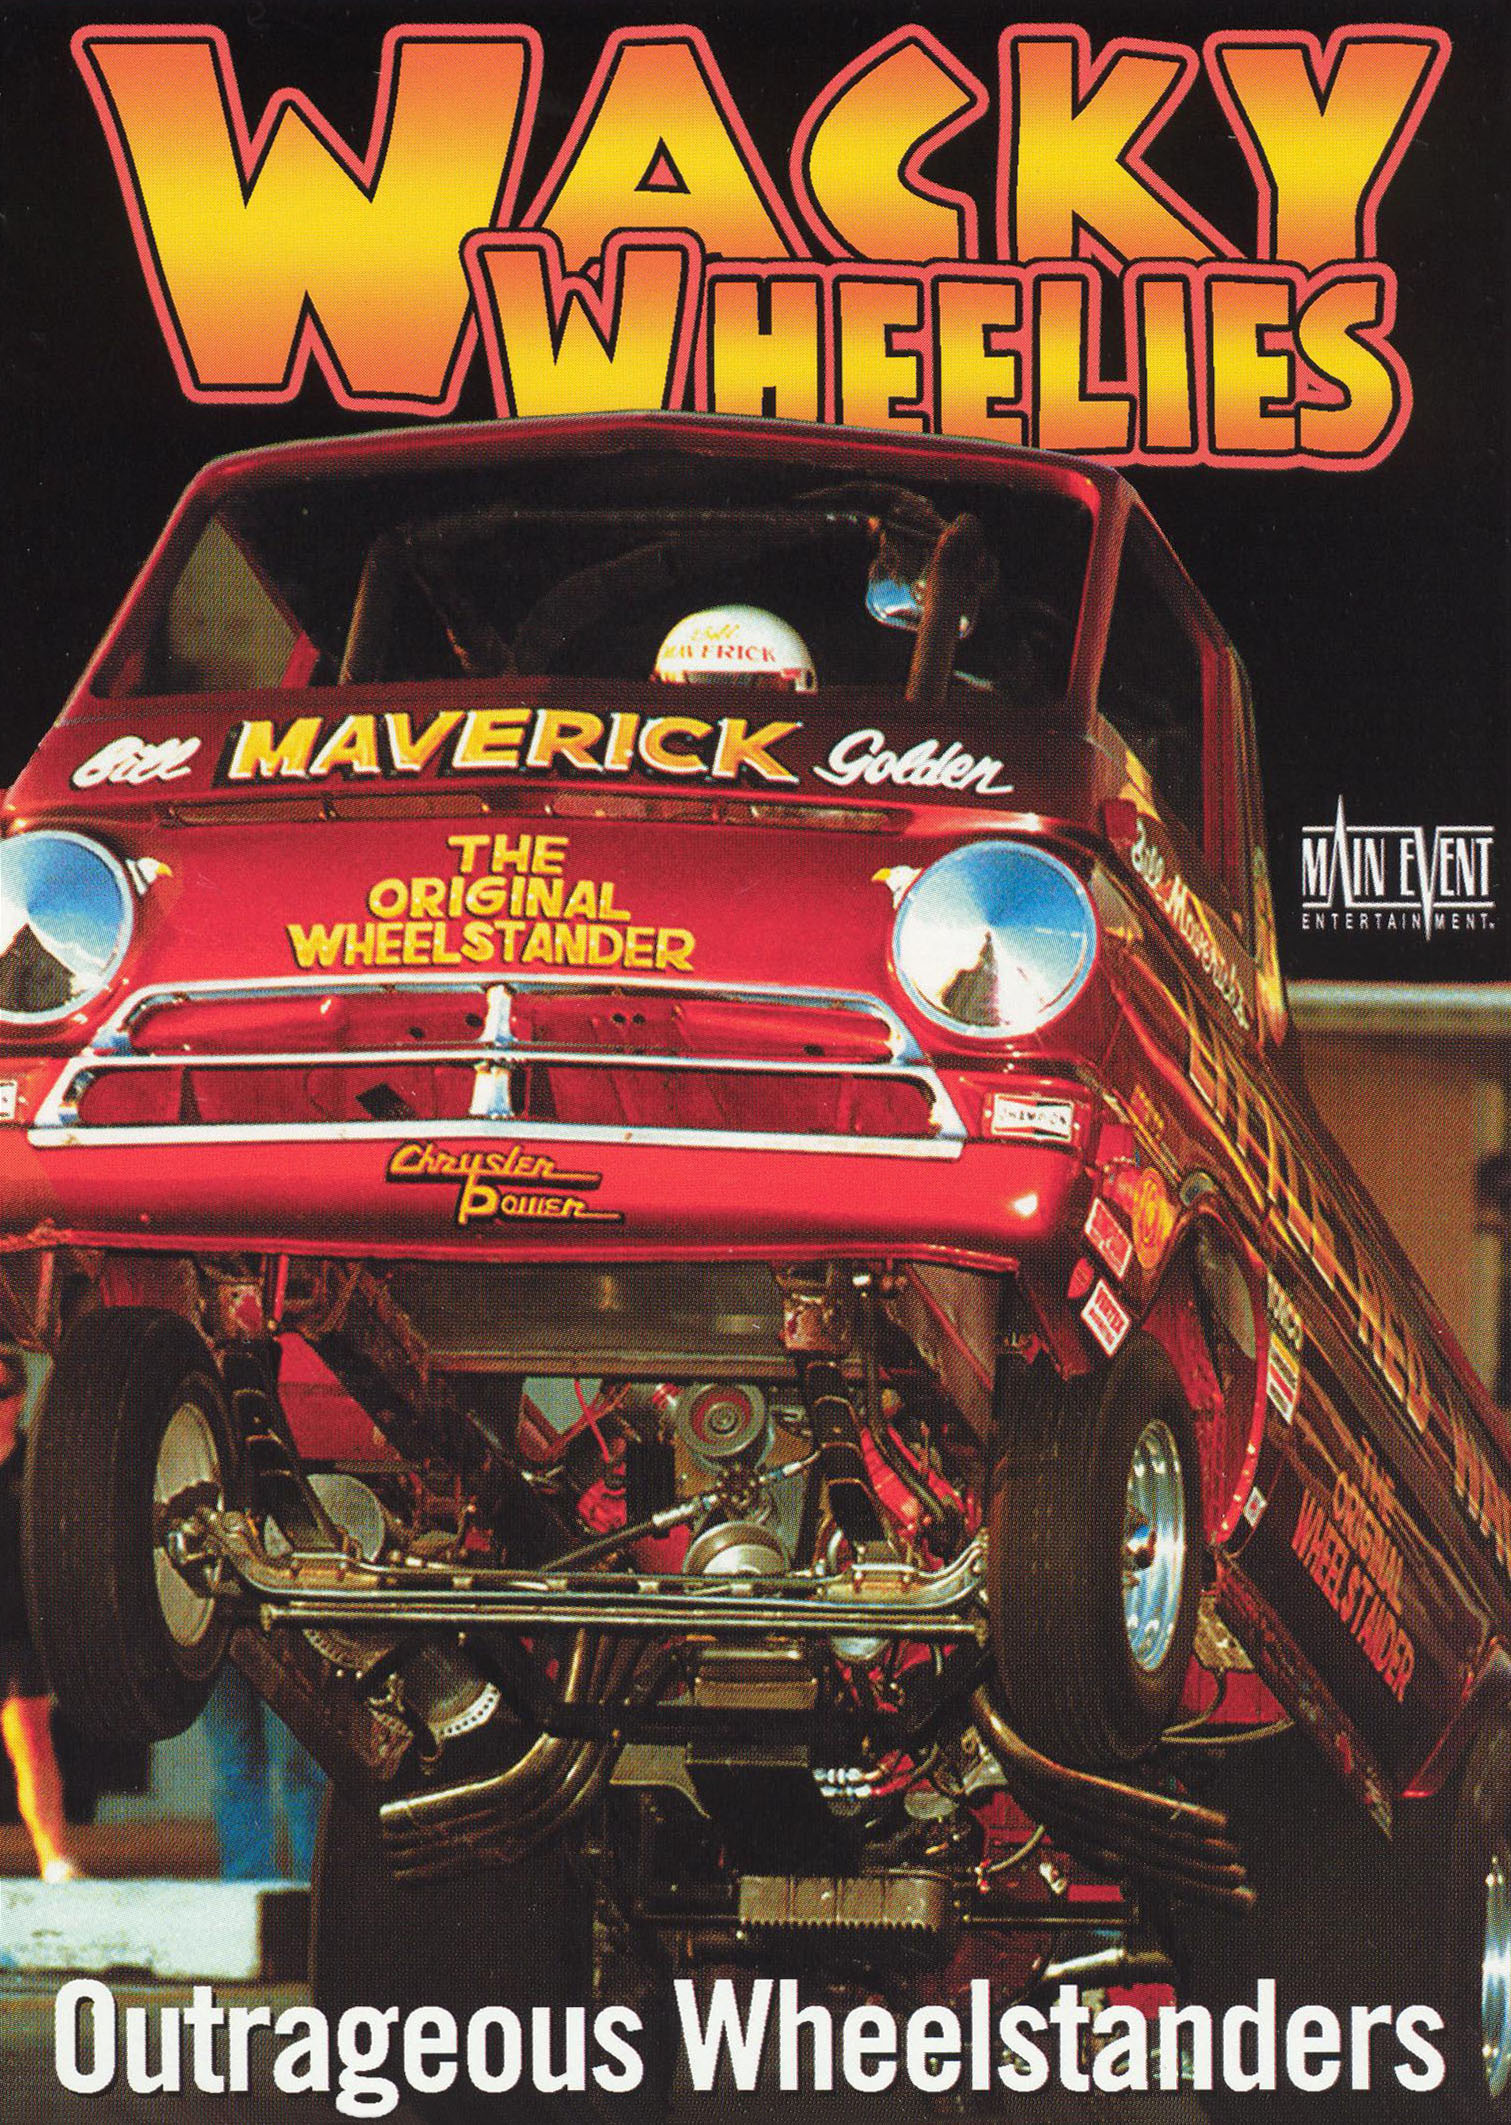 Wacky Wheelies